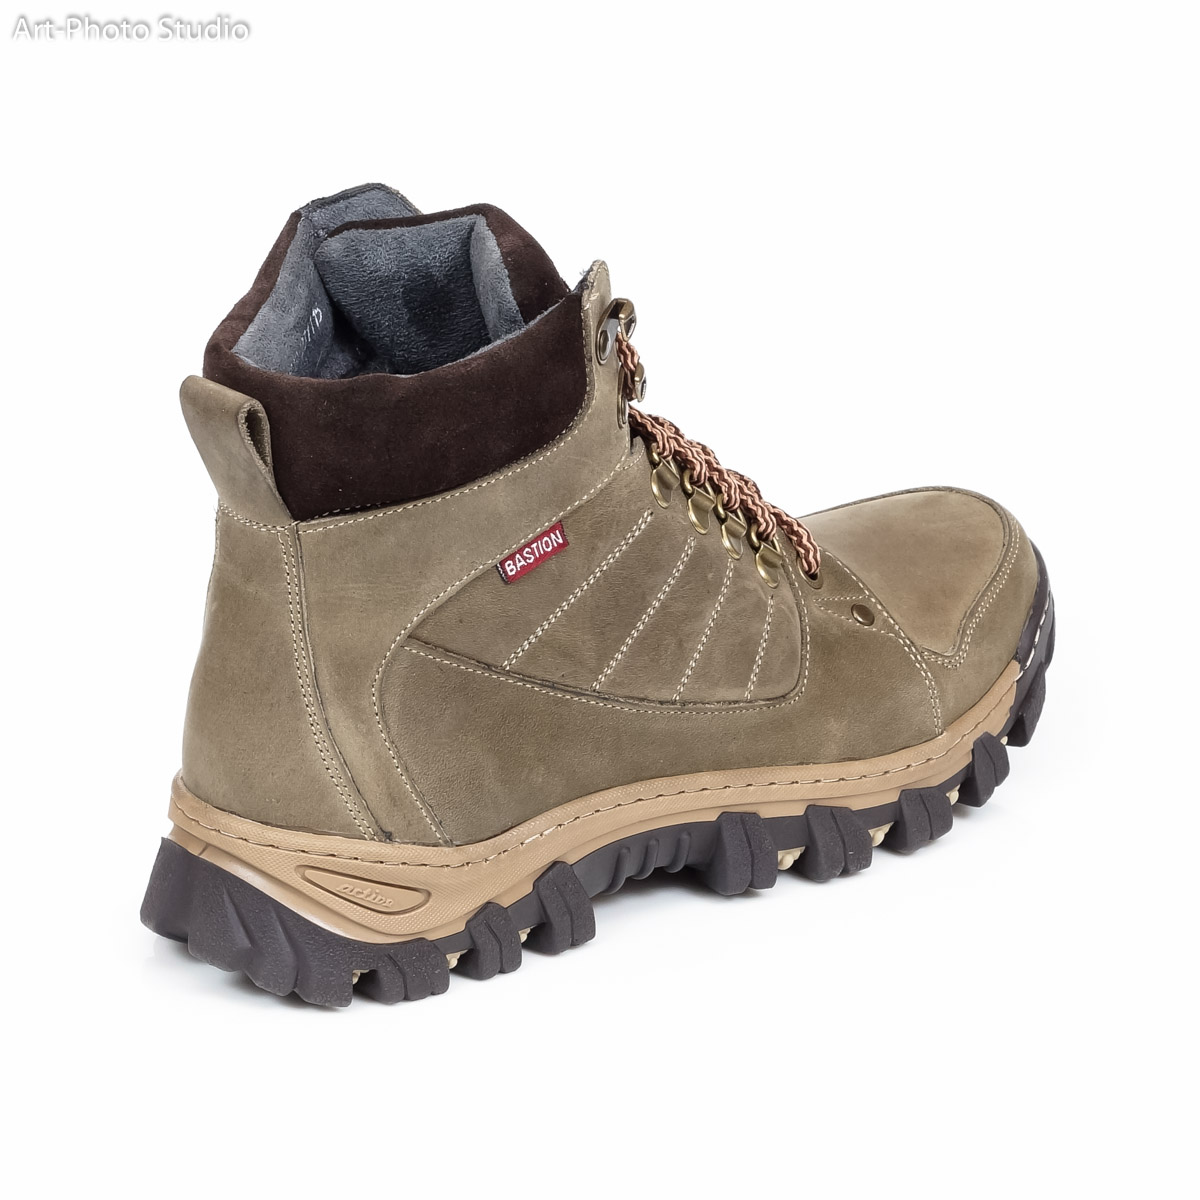 каталожная фотосъемка обуви для интернет-магазина LaModa